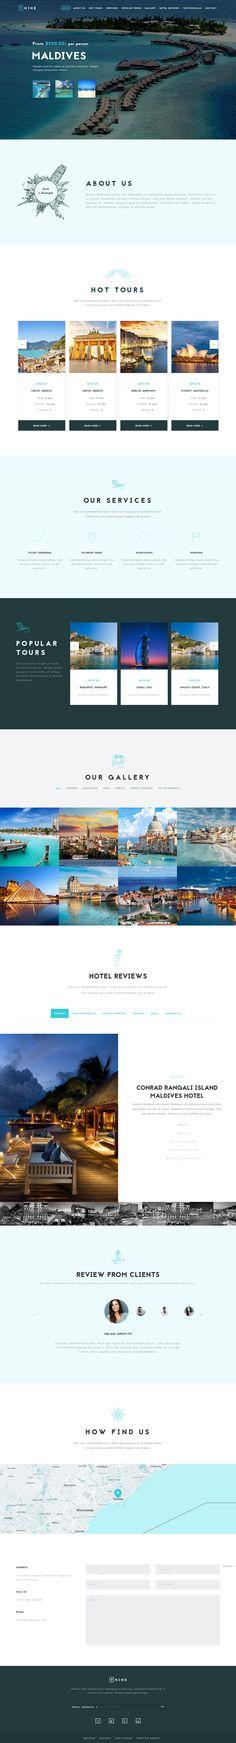 Nine — MultiPurpose One Page Theme - Wordpress Design - - Restaurant, Portfolio, Fashion, Travel and etc.